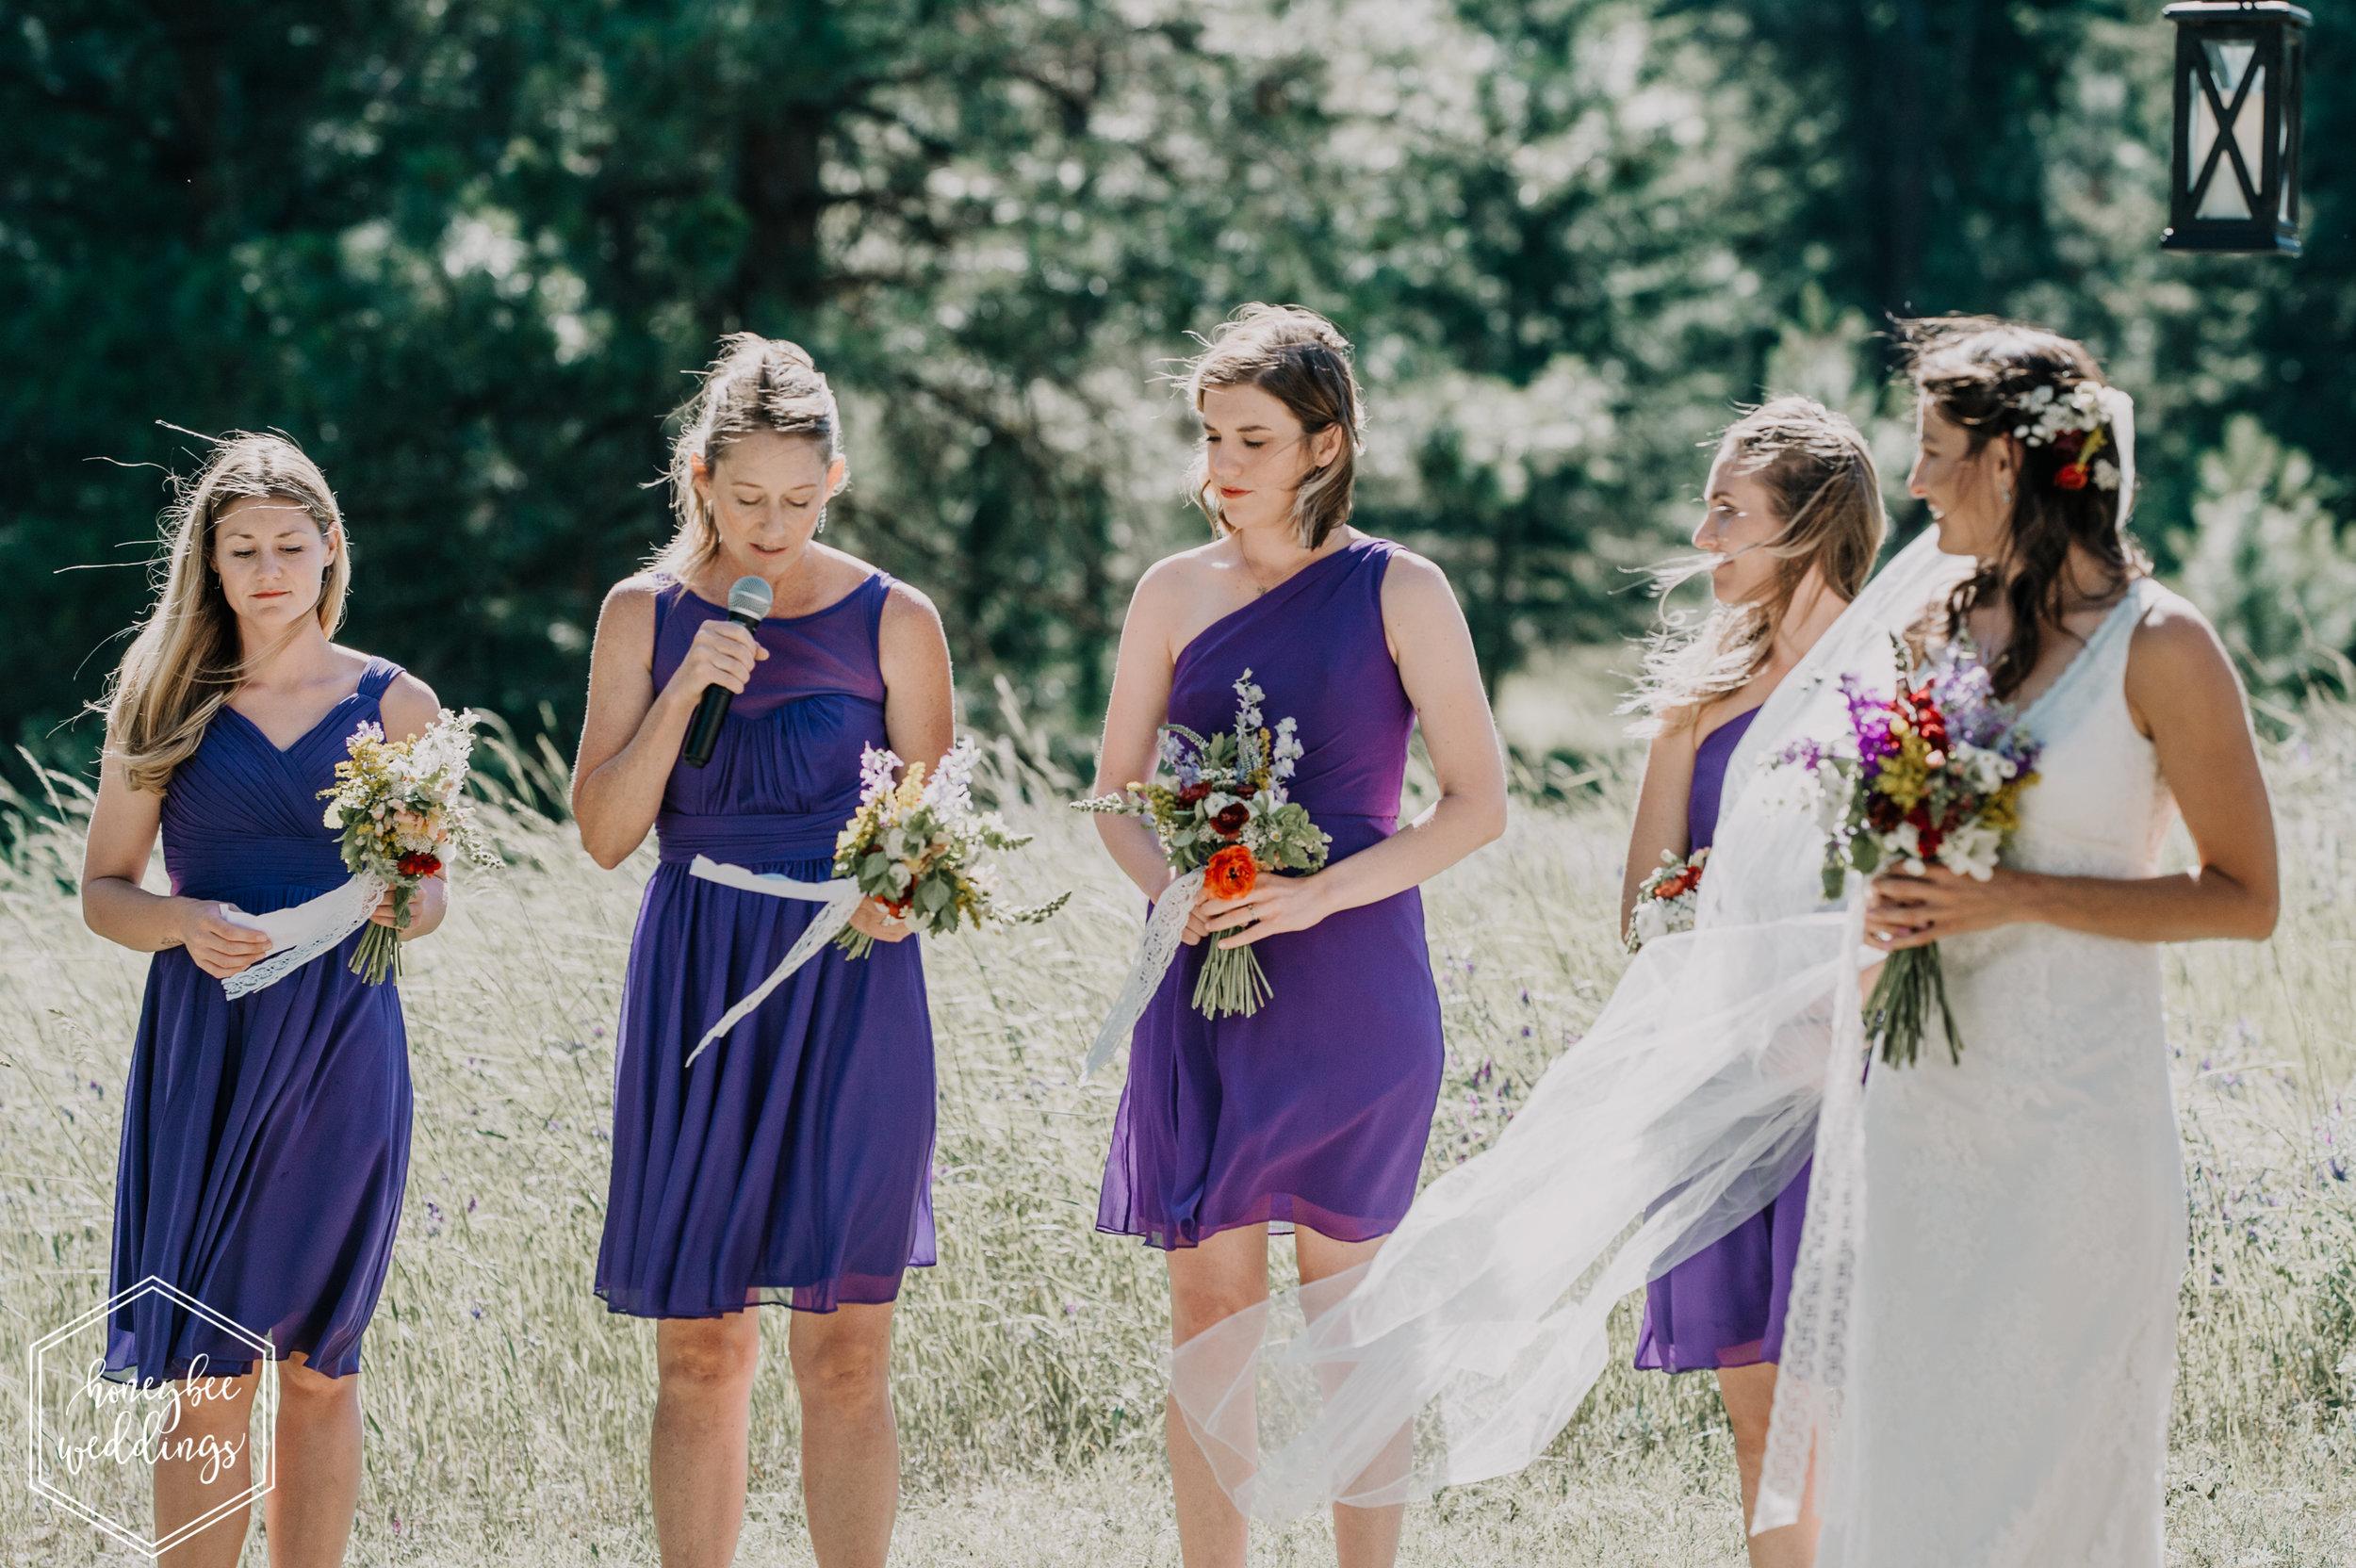 310 White Raven Wedding_Montana Wedding Photographer_Honeybee Weddings_ Meghan Maloney + Arza Hammond 2018-8726.jpg